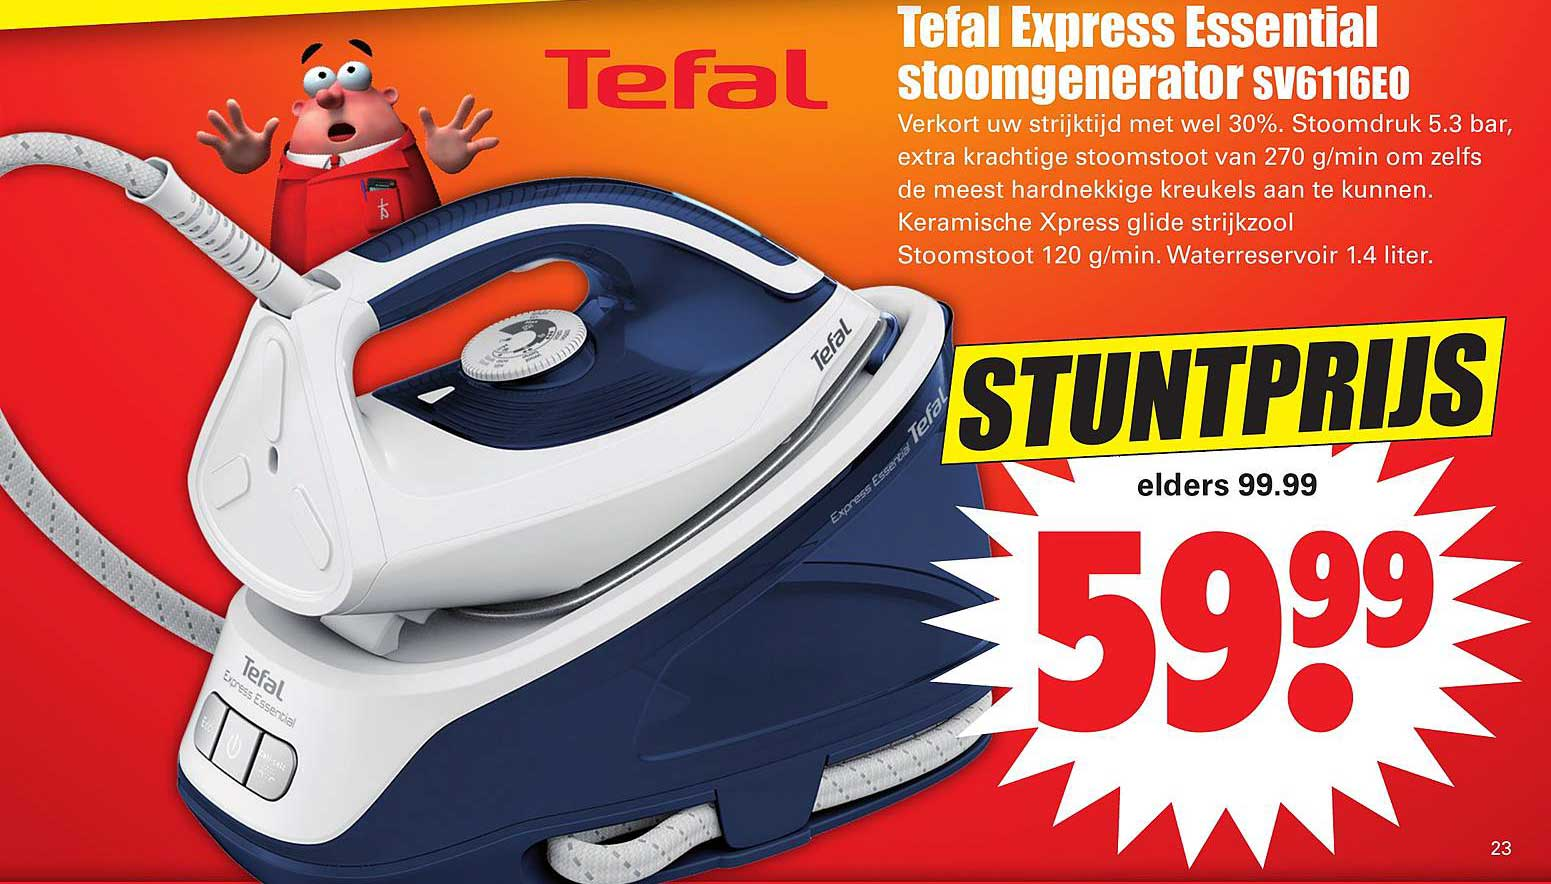 Dirk Tefal Express Essential Stoomgenerator SV6116E0